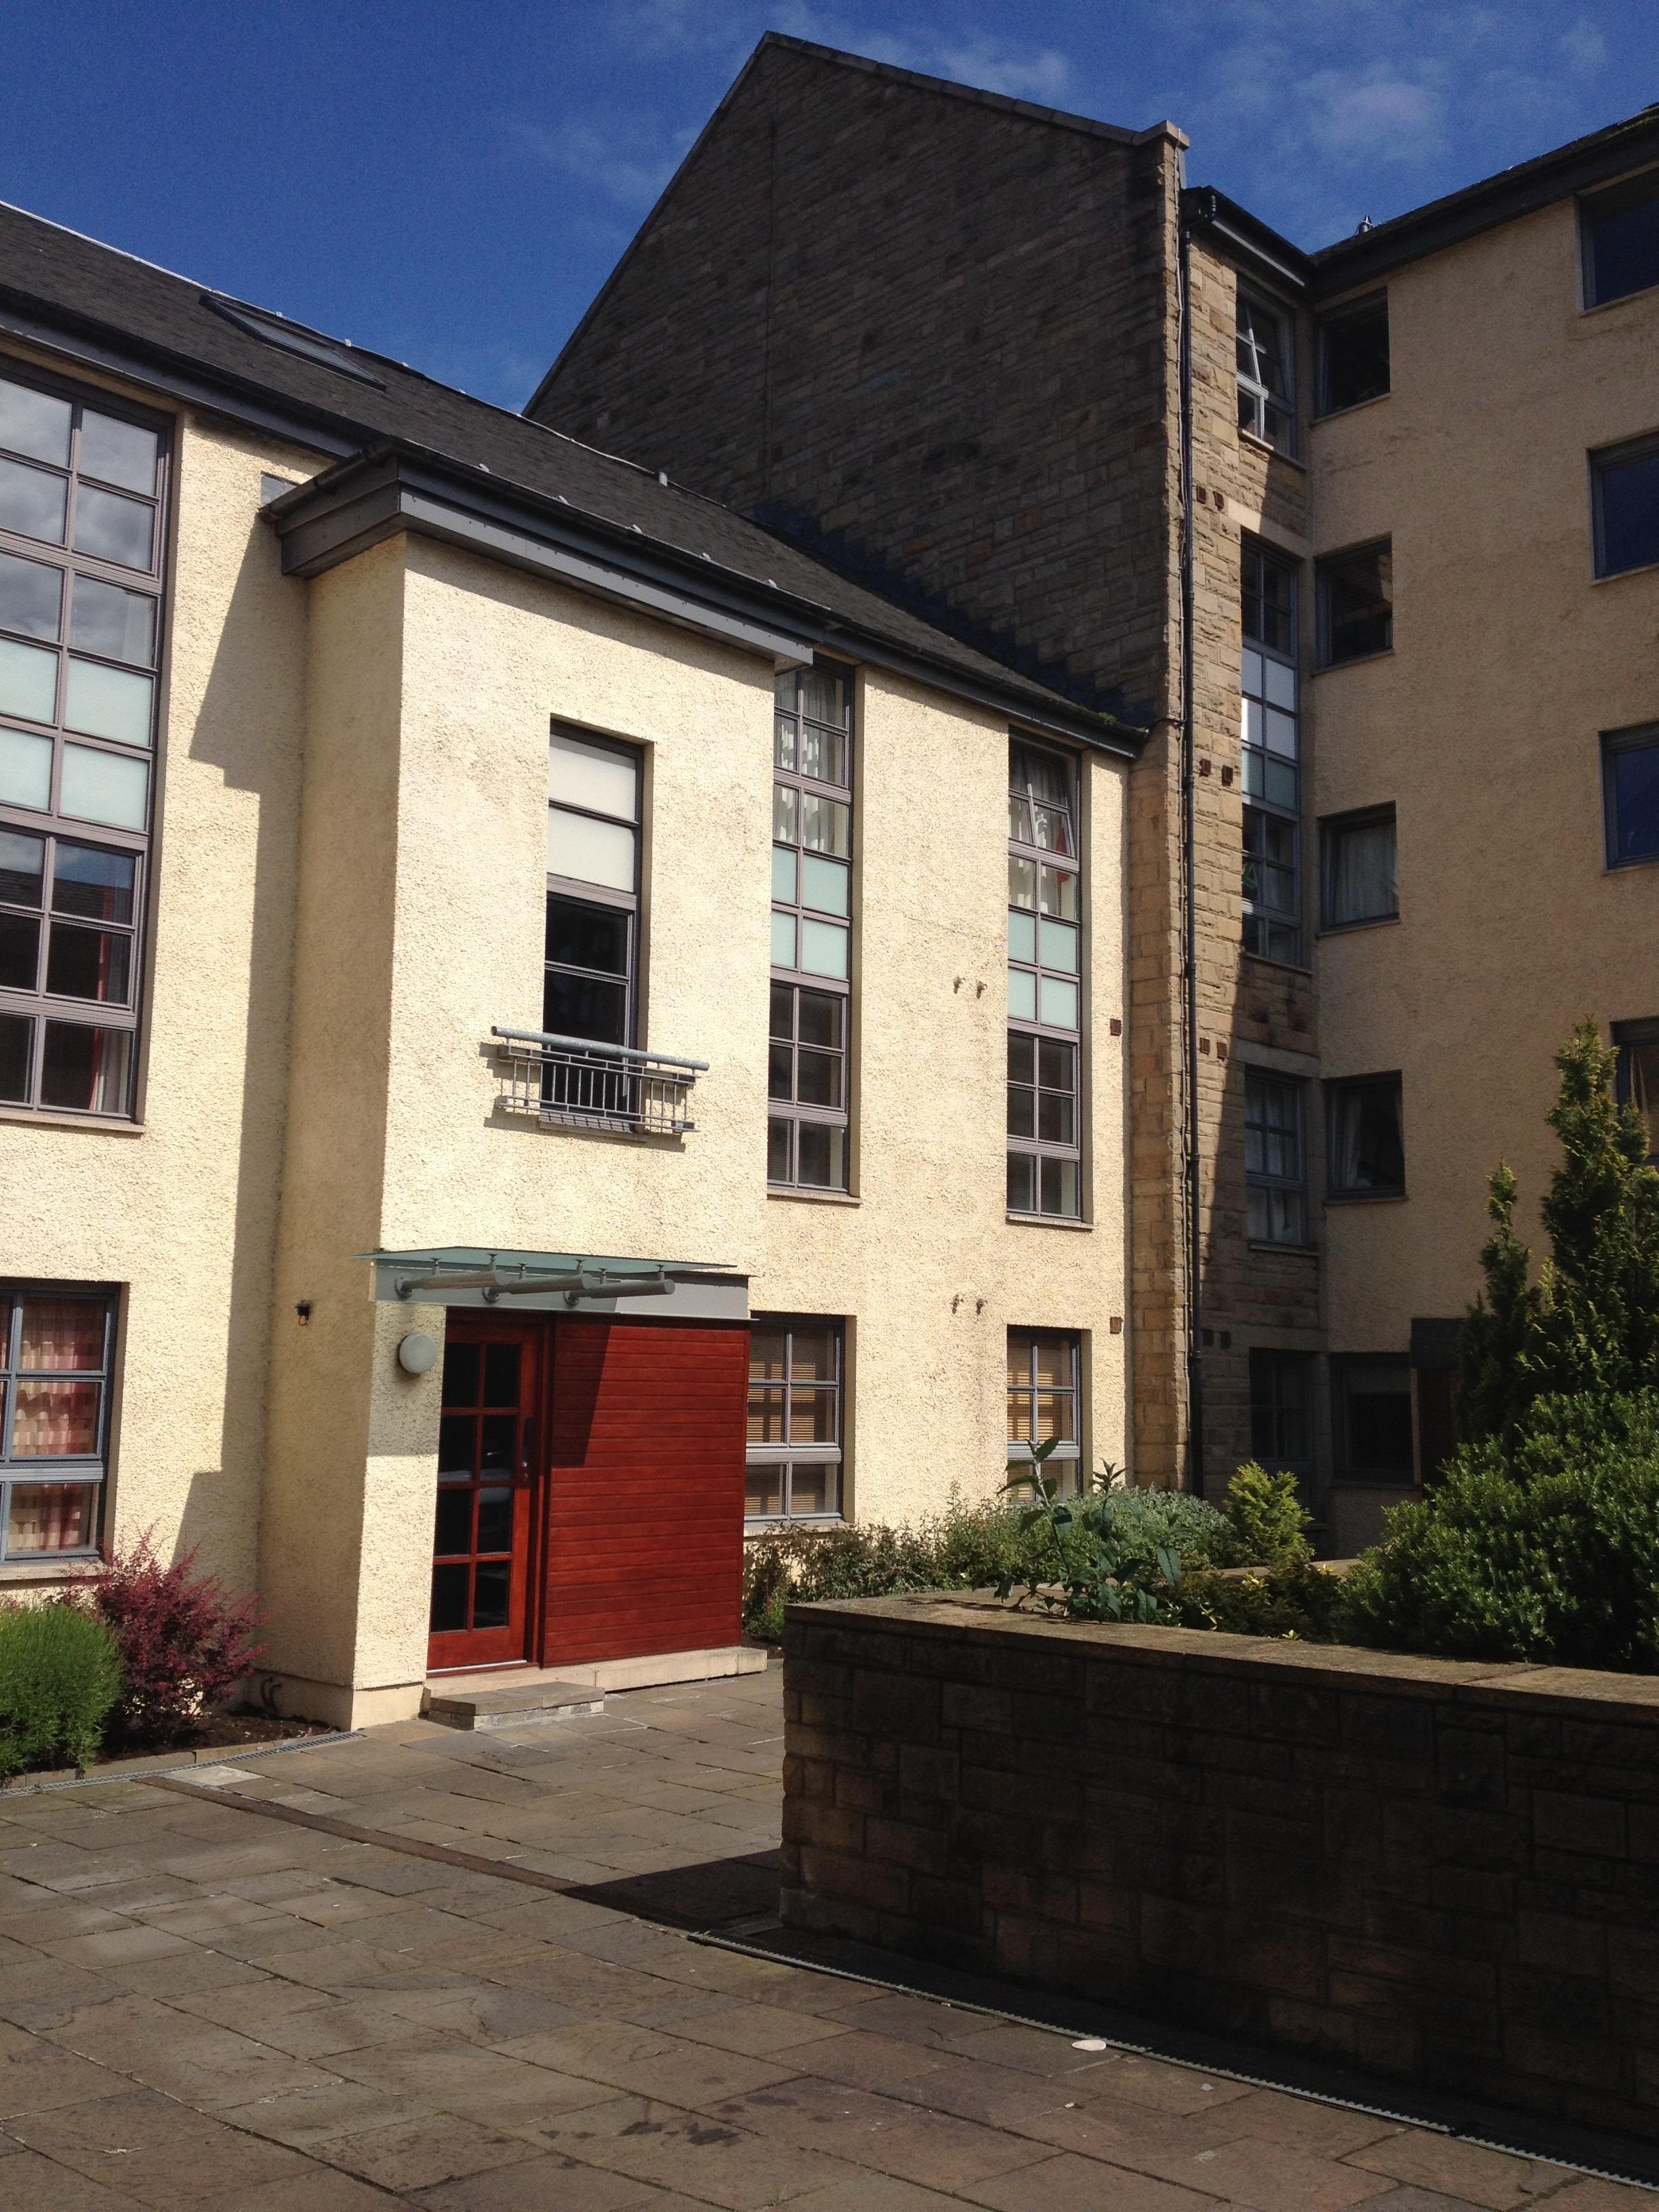 294 Old Tolbooth Wynd Apartment 1 Edinburgh Holiday